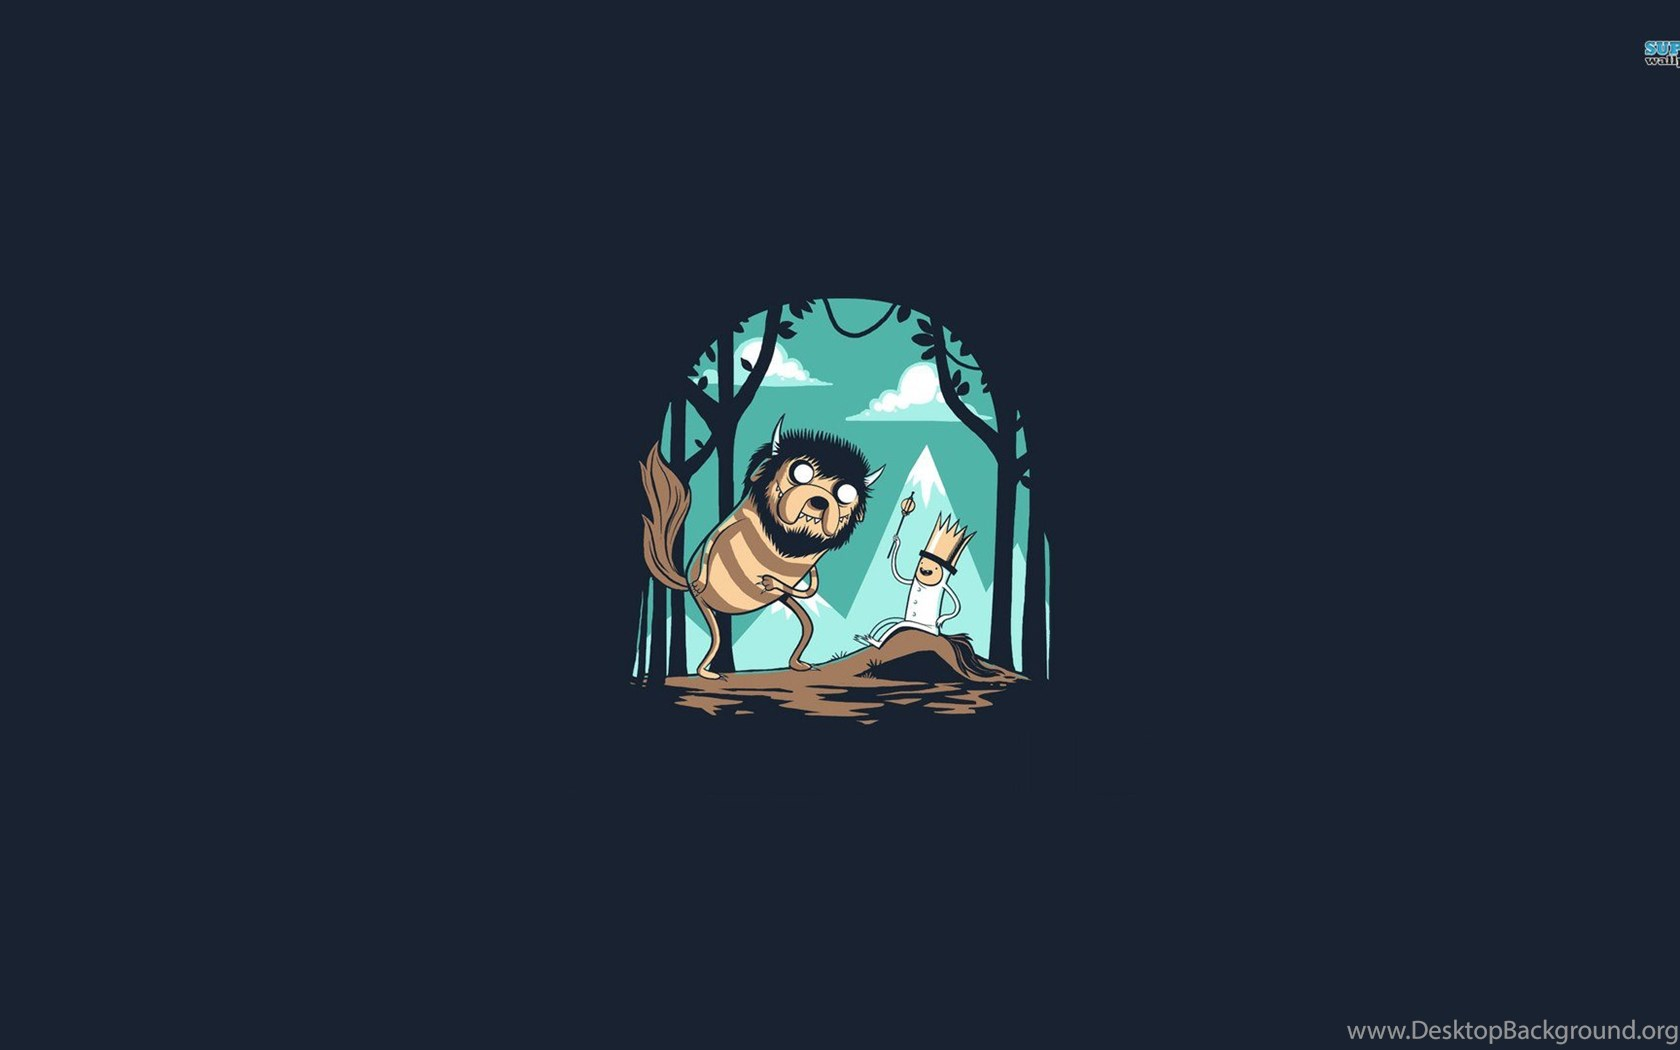 Adventure Time Wallpapers Hd 1080p Desktop Background